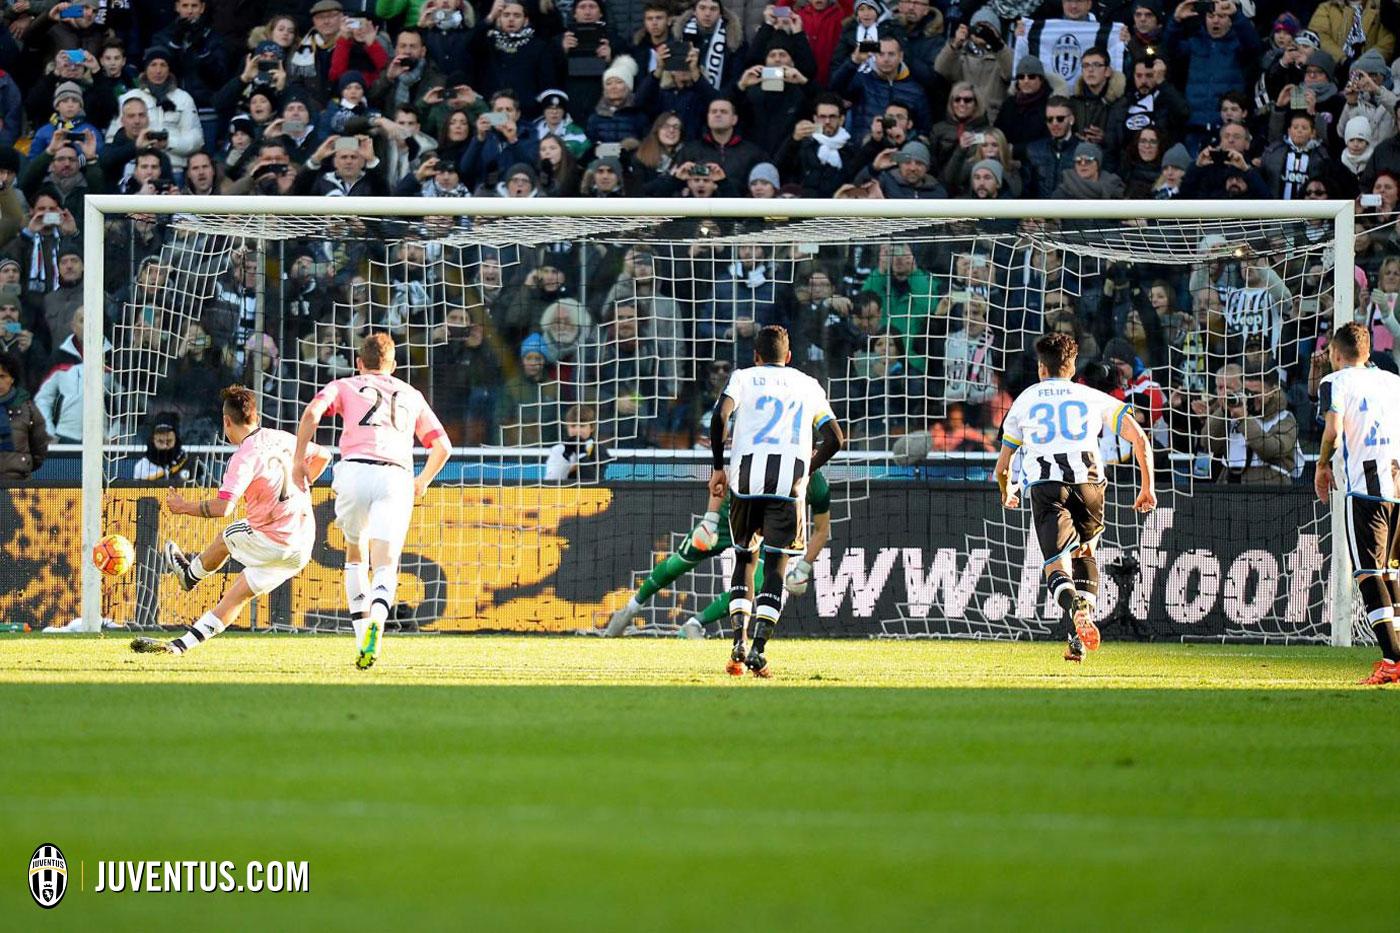 Salisburgo Napoli Hd: Napoli Juventus 3 2 Highlights Hd Gol Coppa Italia